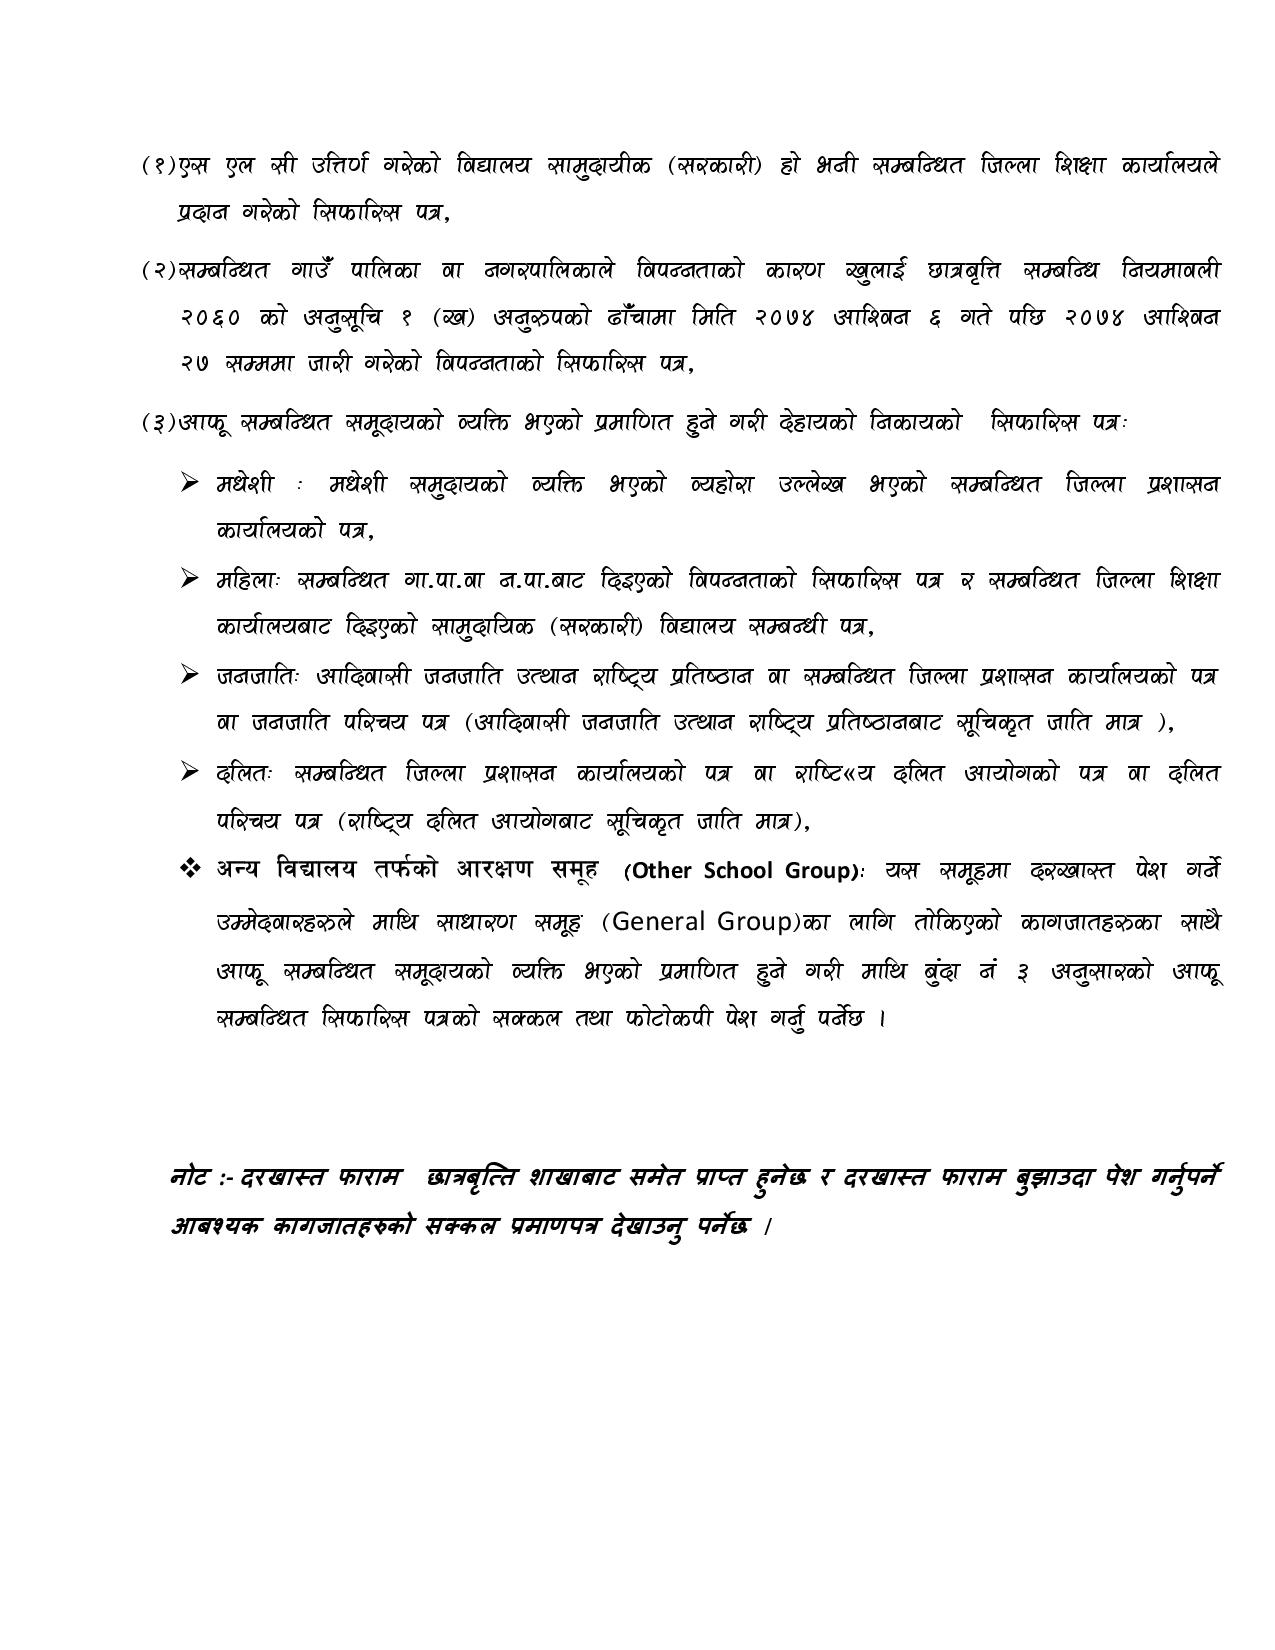 Nepal Government Scholarship For Study In D Pharmacy Under Ptap Program